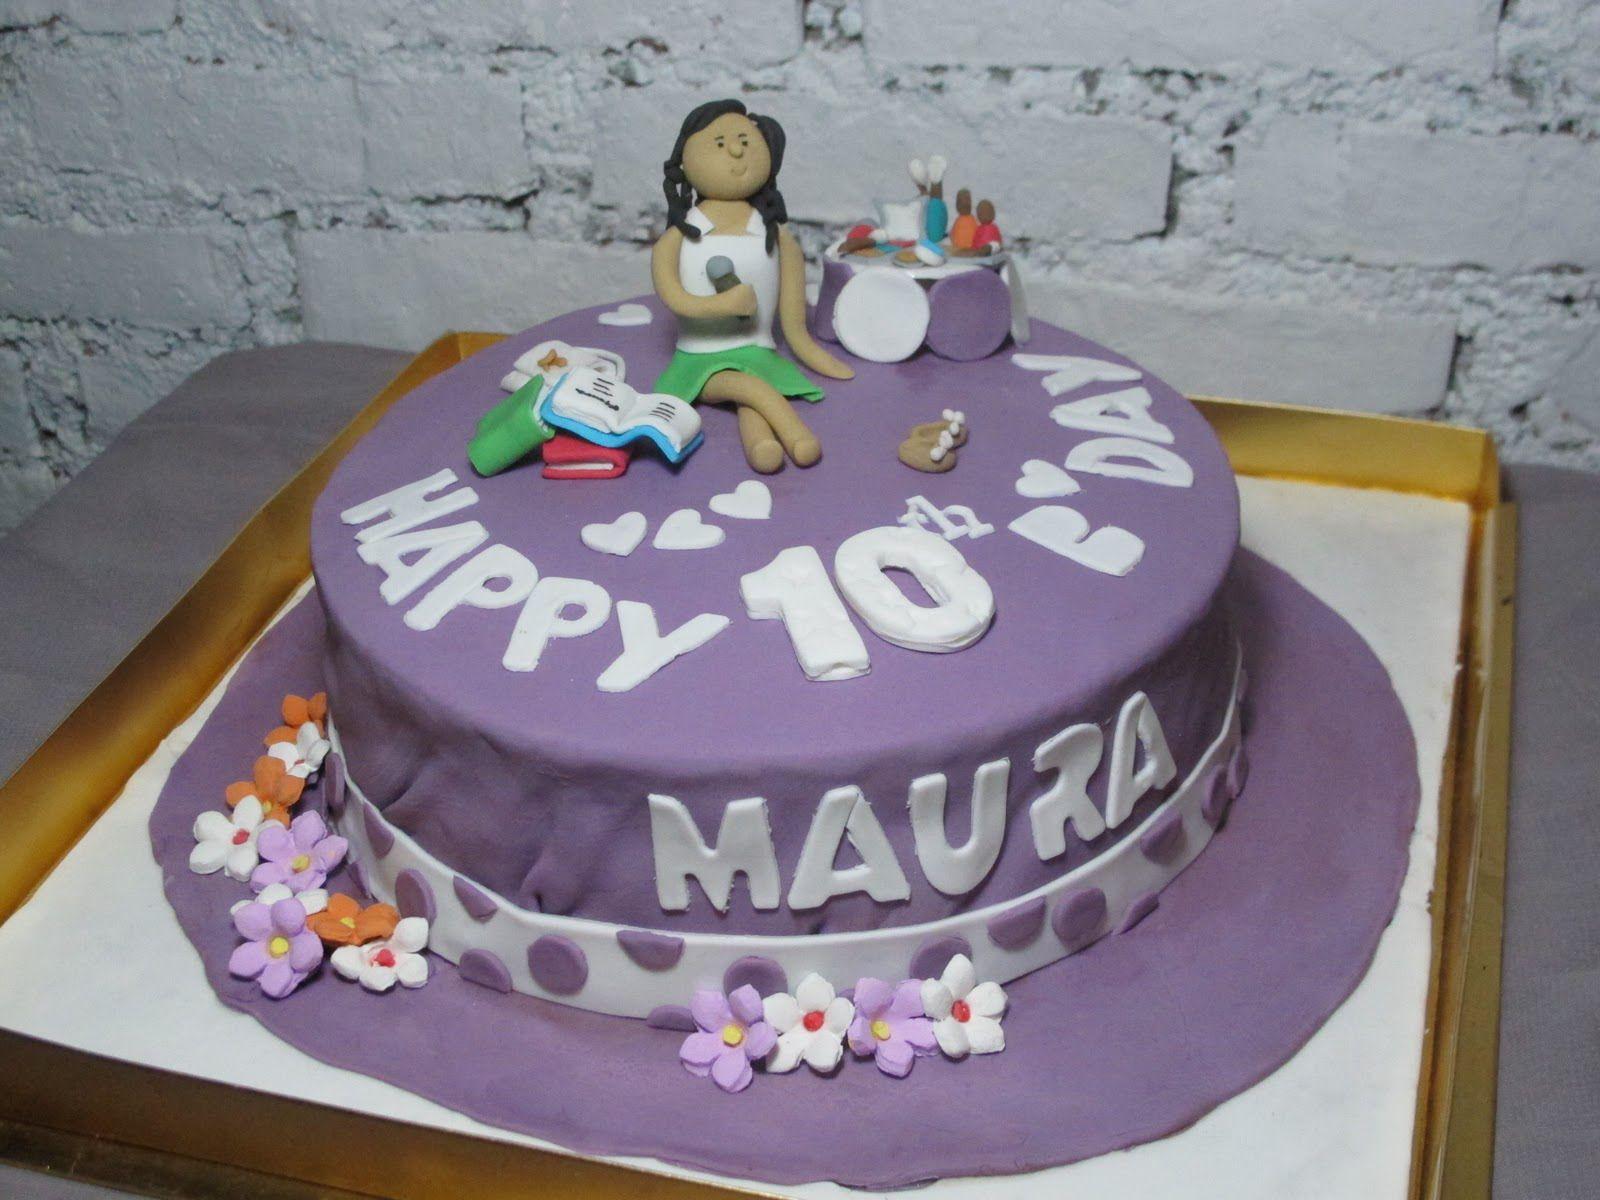 Diy Birthday Hats Pinterest 10 Year Old Girl Birthday Cake Ideas Birthday Hat Diy Birthday Birthday Cake Girls